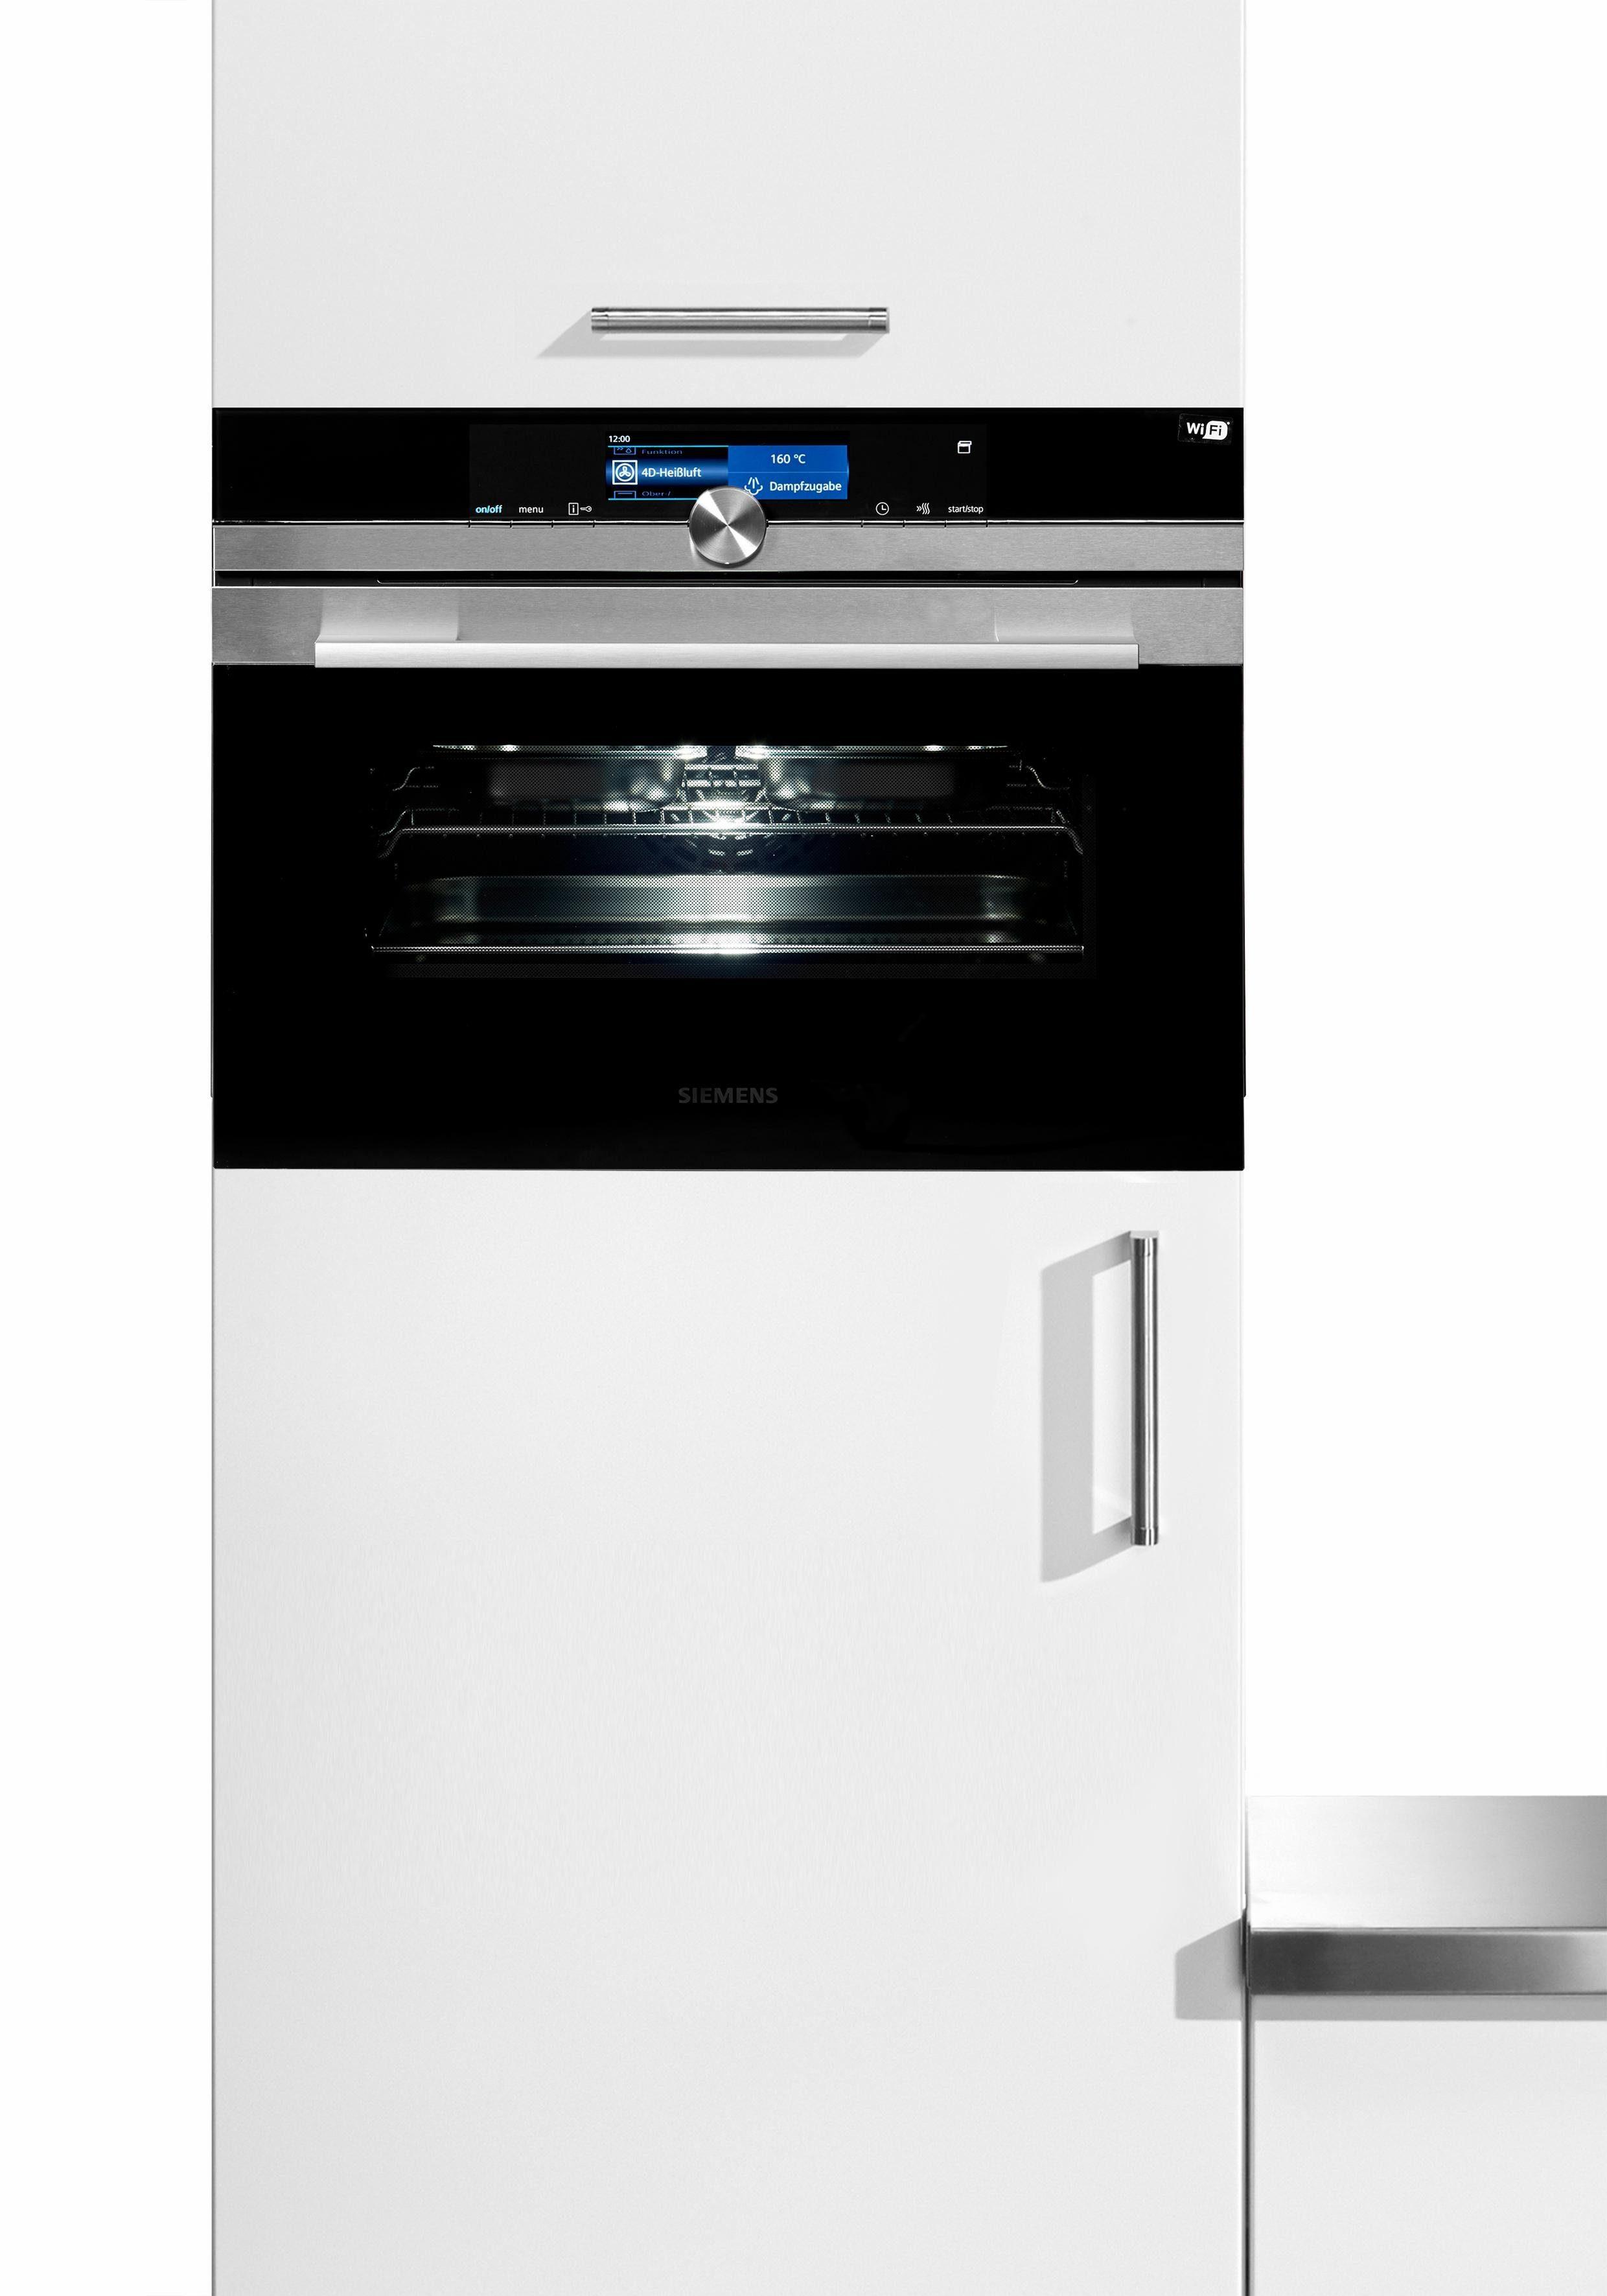 "Siemens Einbau-Kompaktdampfbackofen iQ700 ""CS658GRS6"" - Home Connect fähig, A+"